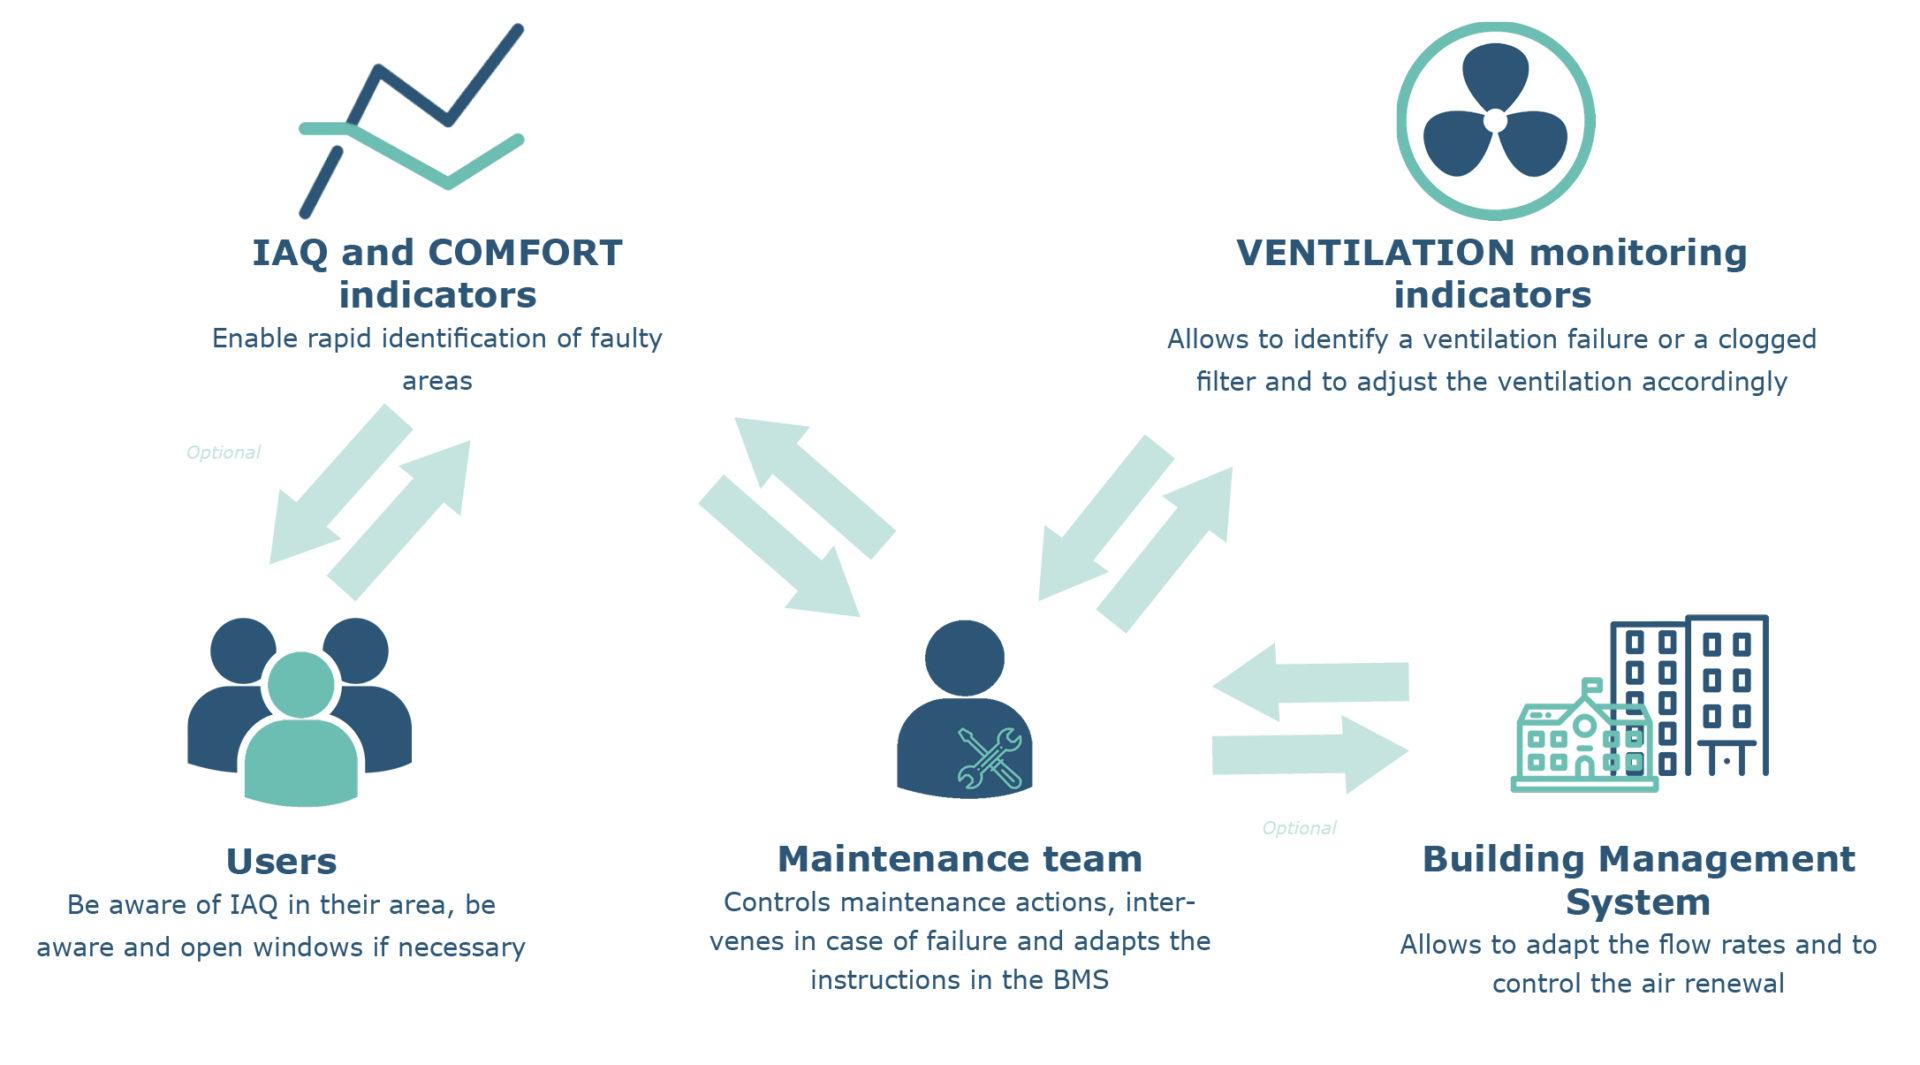 iot-air-quality-interior-iaq-comfort-building-ventilation